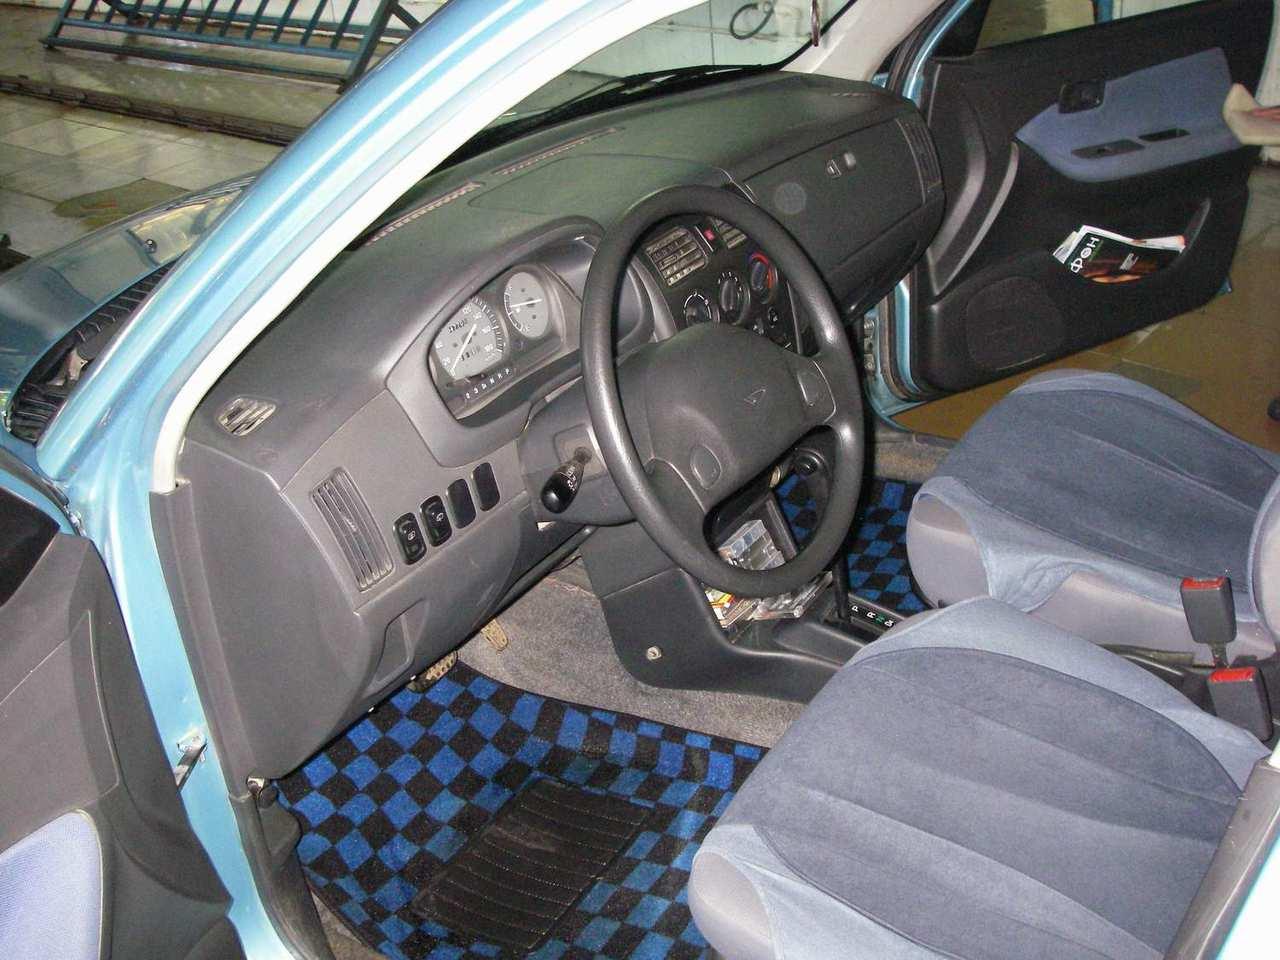 2003 daihatsu sirion pictures 986cc gasoline ff. Black Bedroom Furniture Sets. Home Design Ideas